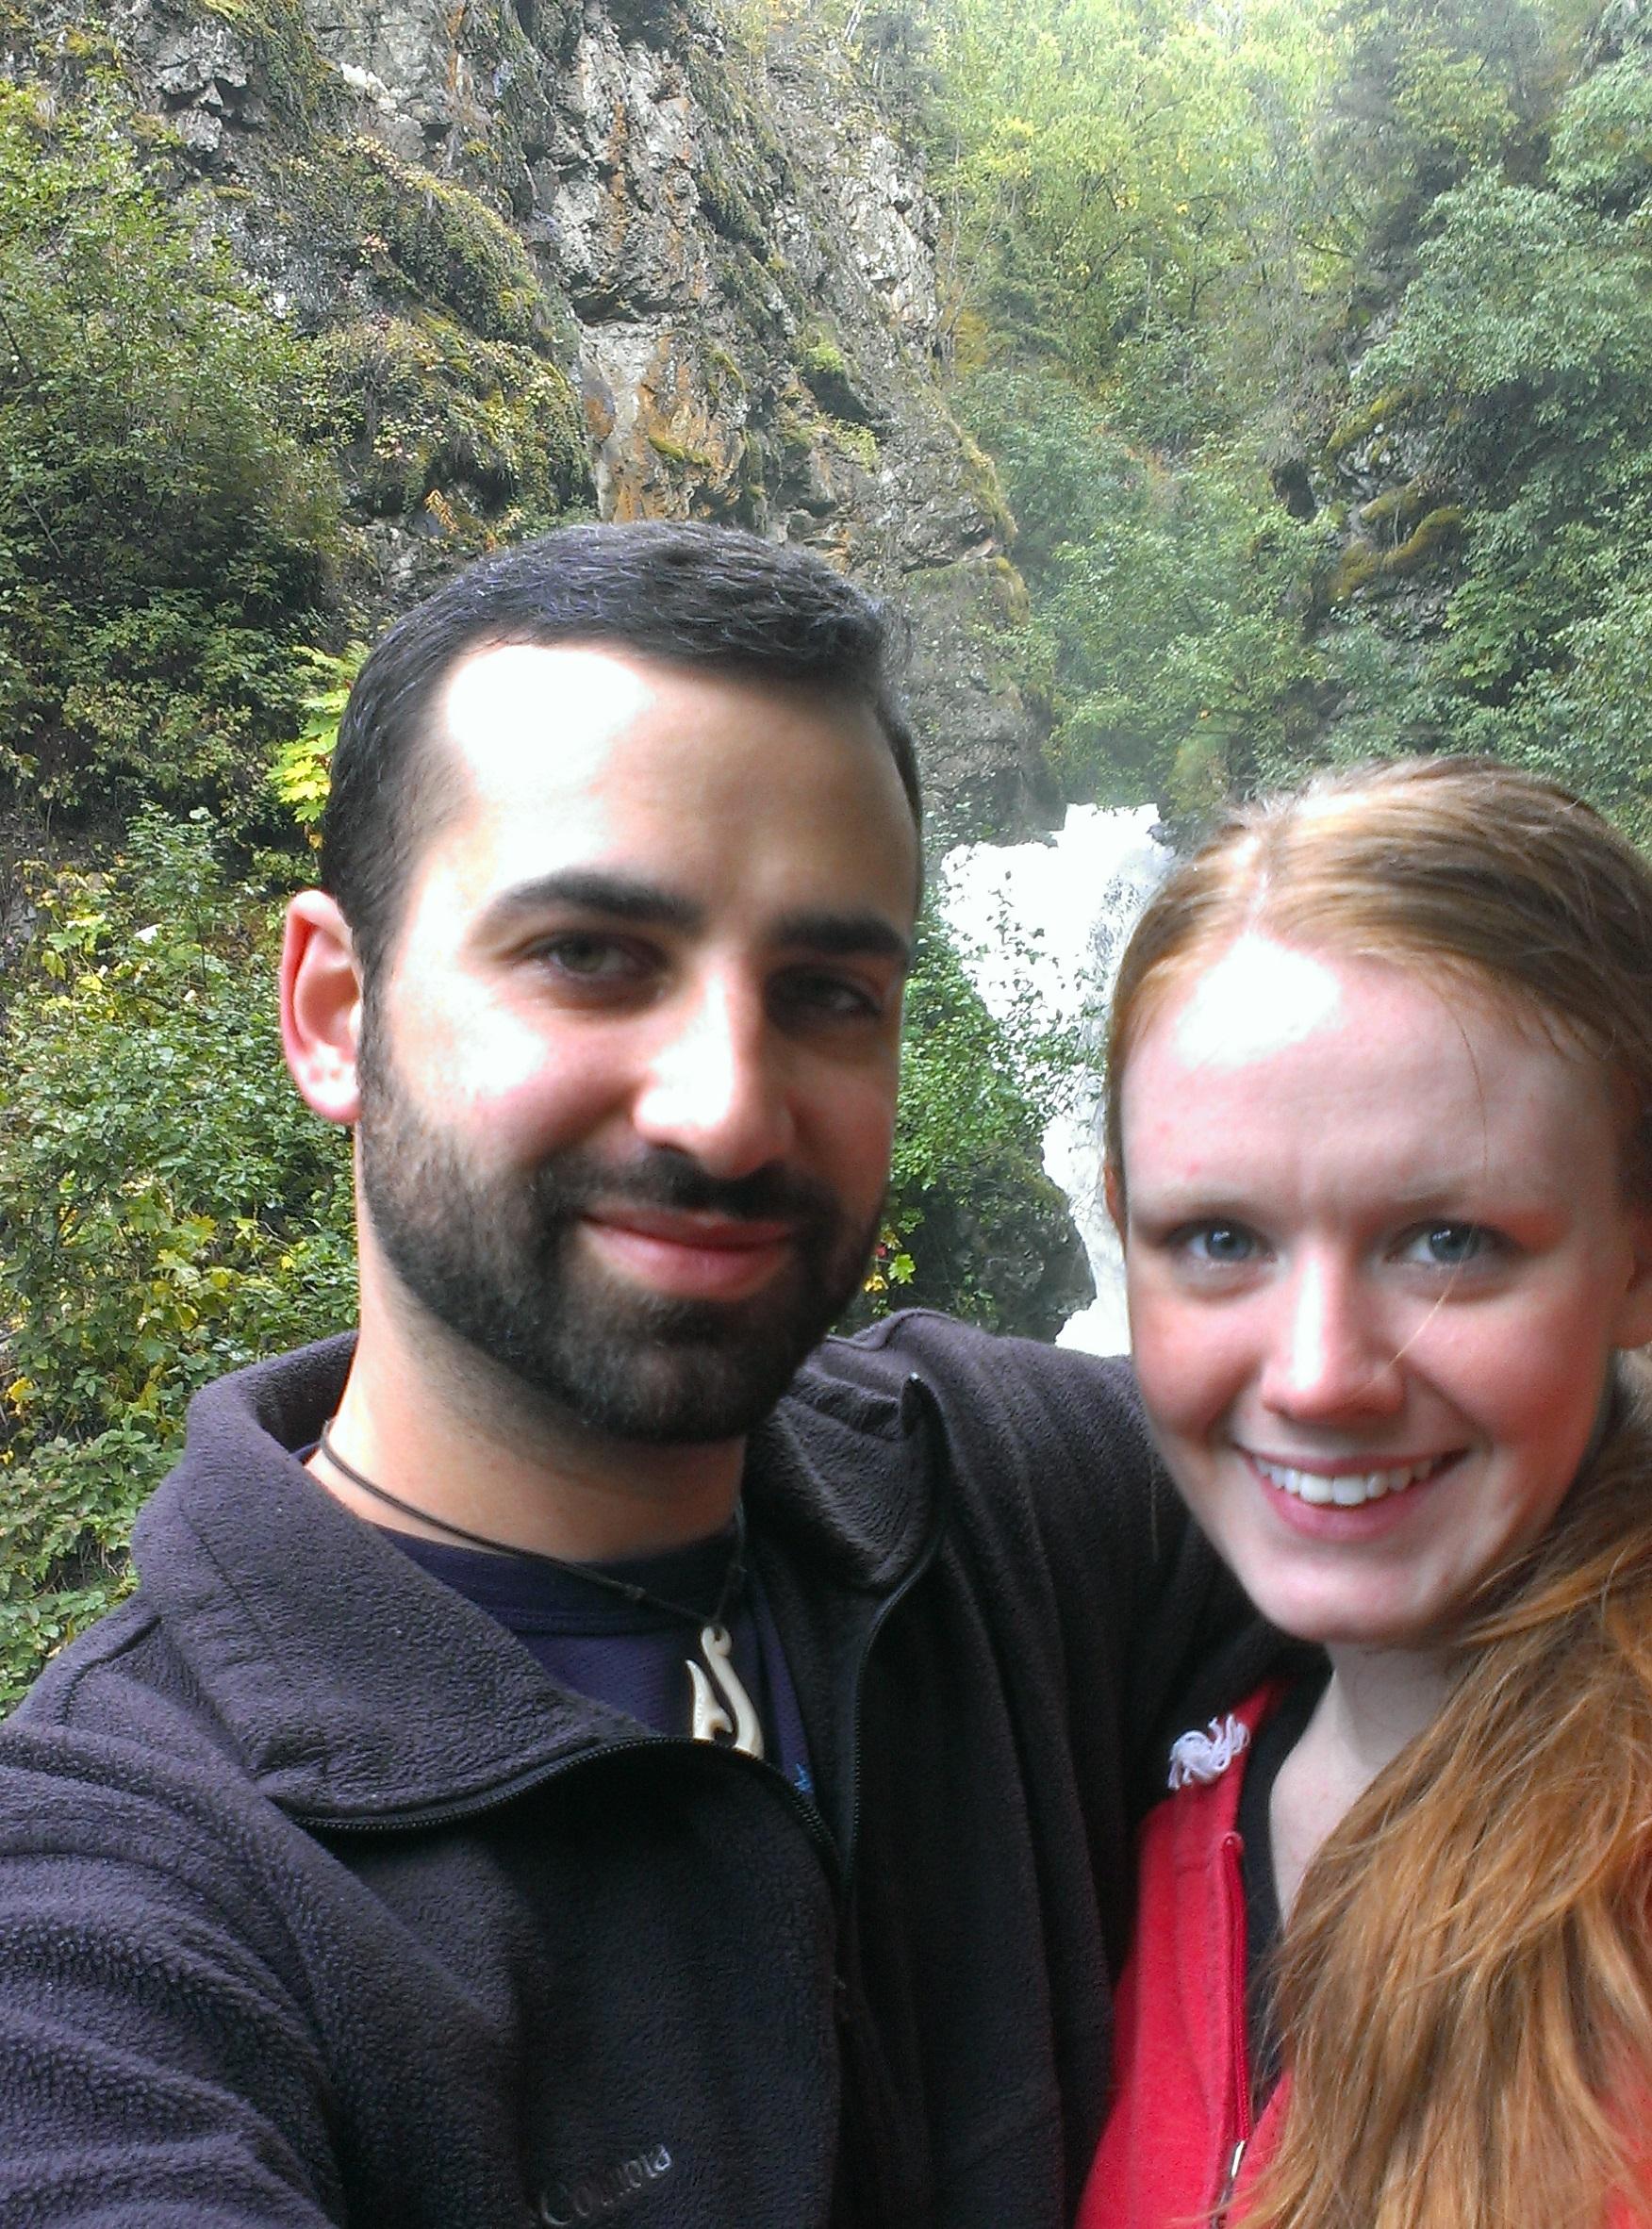 Gavin and his fiance Sydney Taylor hiking in Alaska.